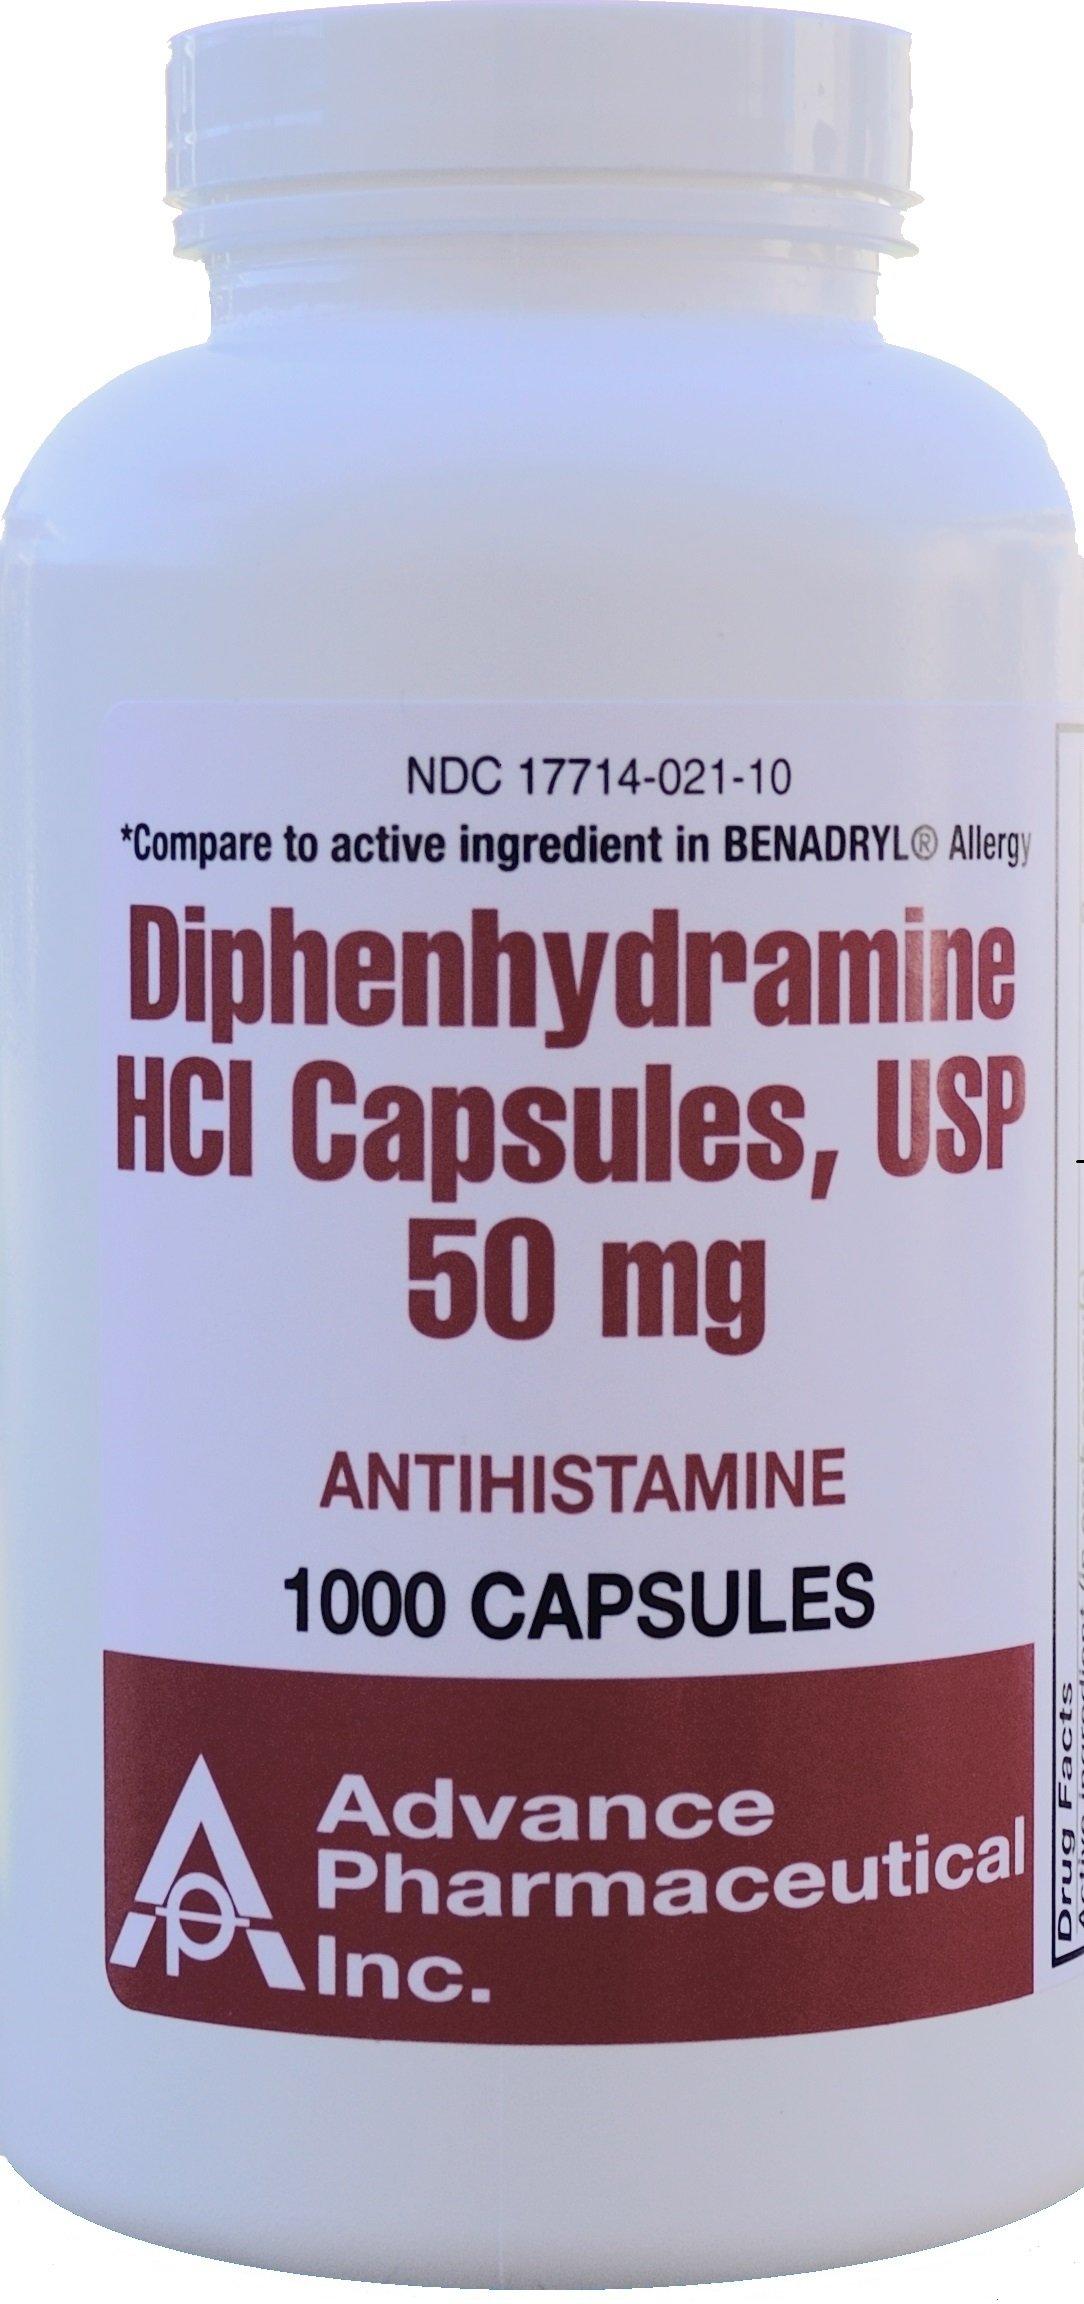 Diphenhydramine HCI 50 mg Allergy Medicine and Antihistamine Generic for Benadryl Allergy 1000 Capsules per Bottle